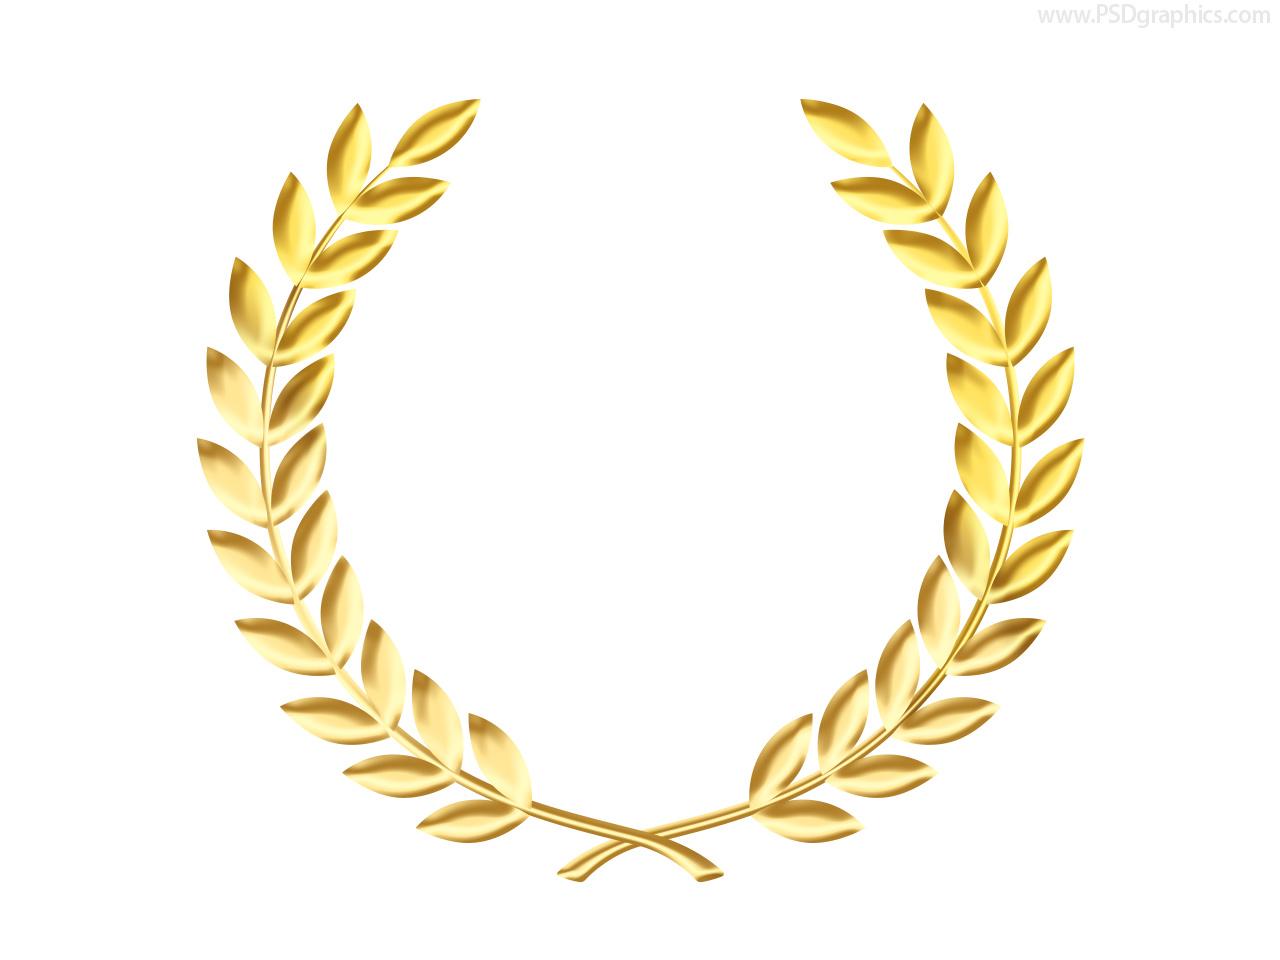 Wreath clipart medal PSDGraphics medal Clip wreath Gold